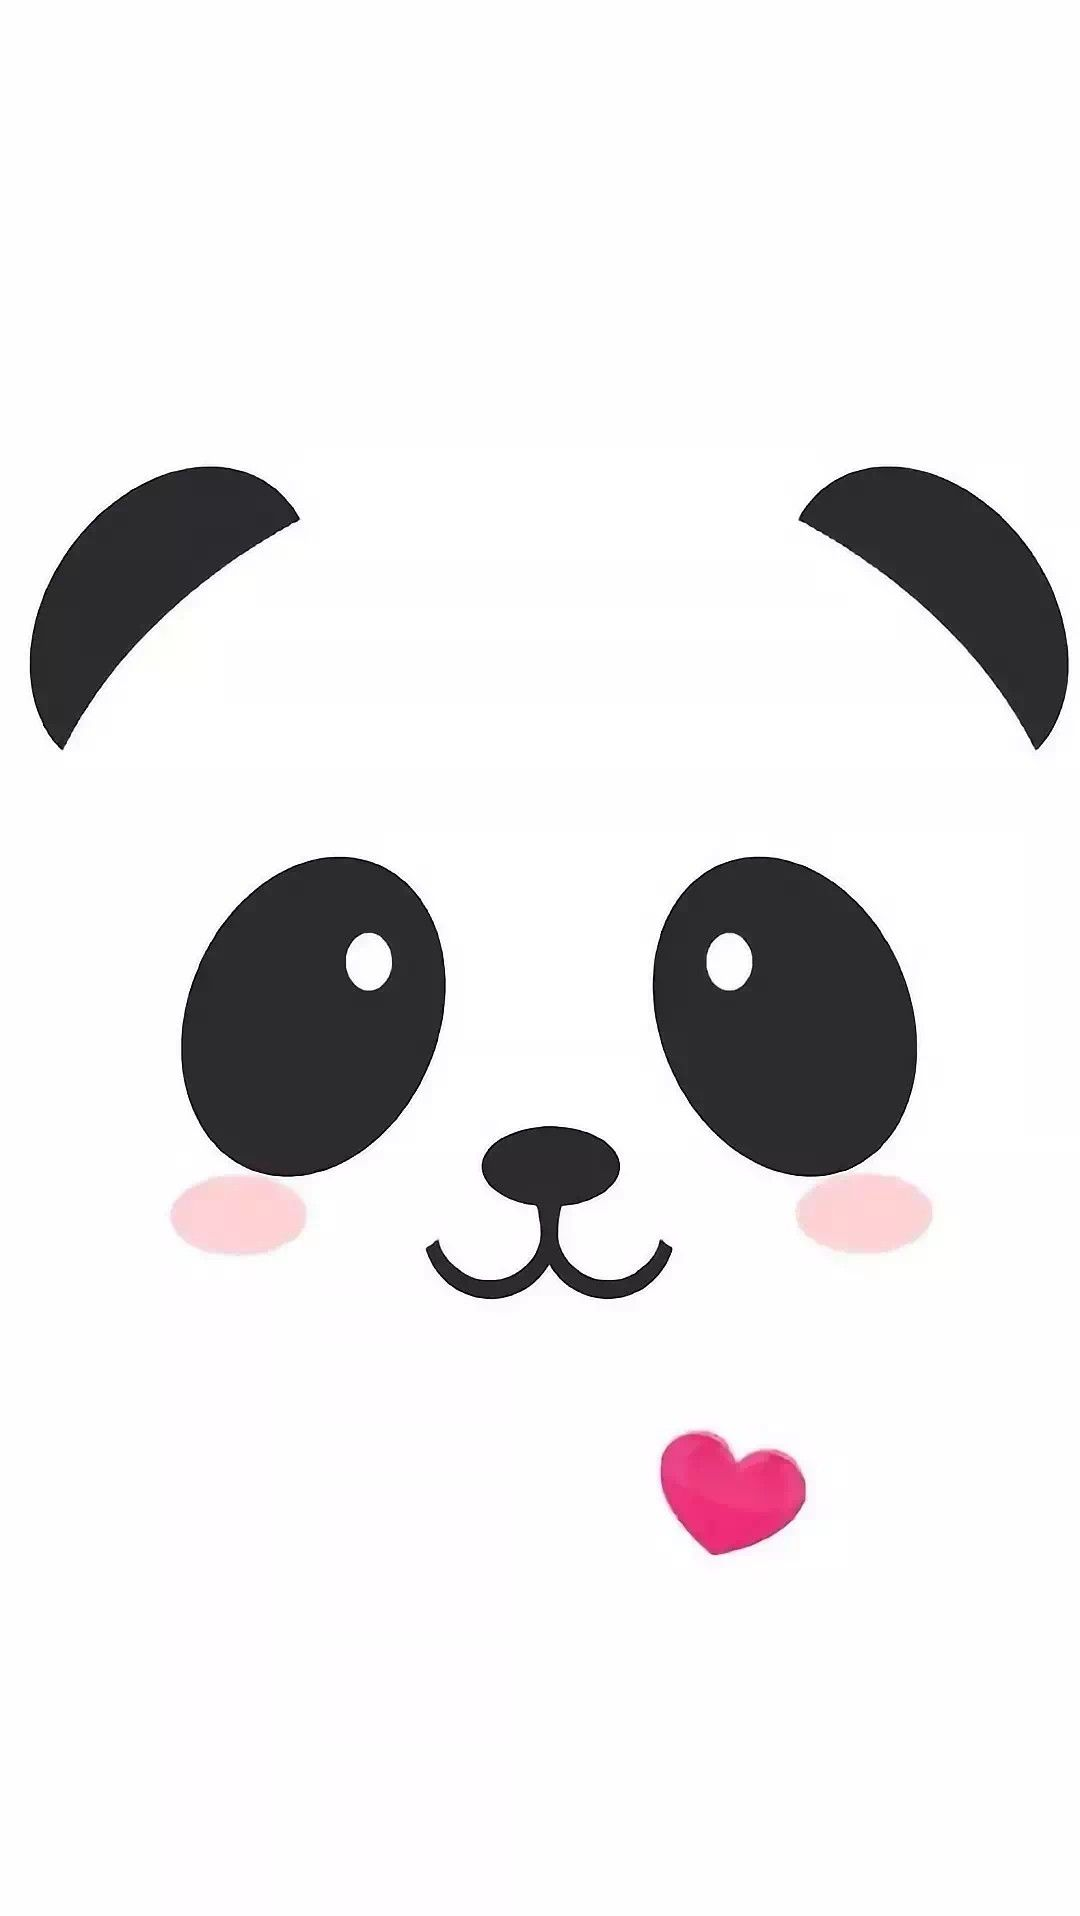 Cute Panda Wallpaper Cute Panda Wallpaper Panda Wallpaper Iphone Panda Wallpapers